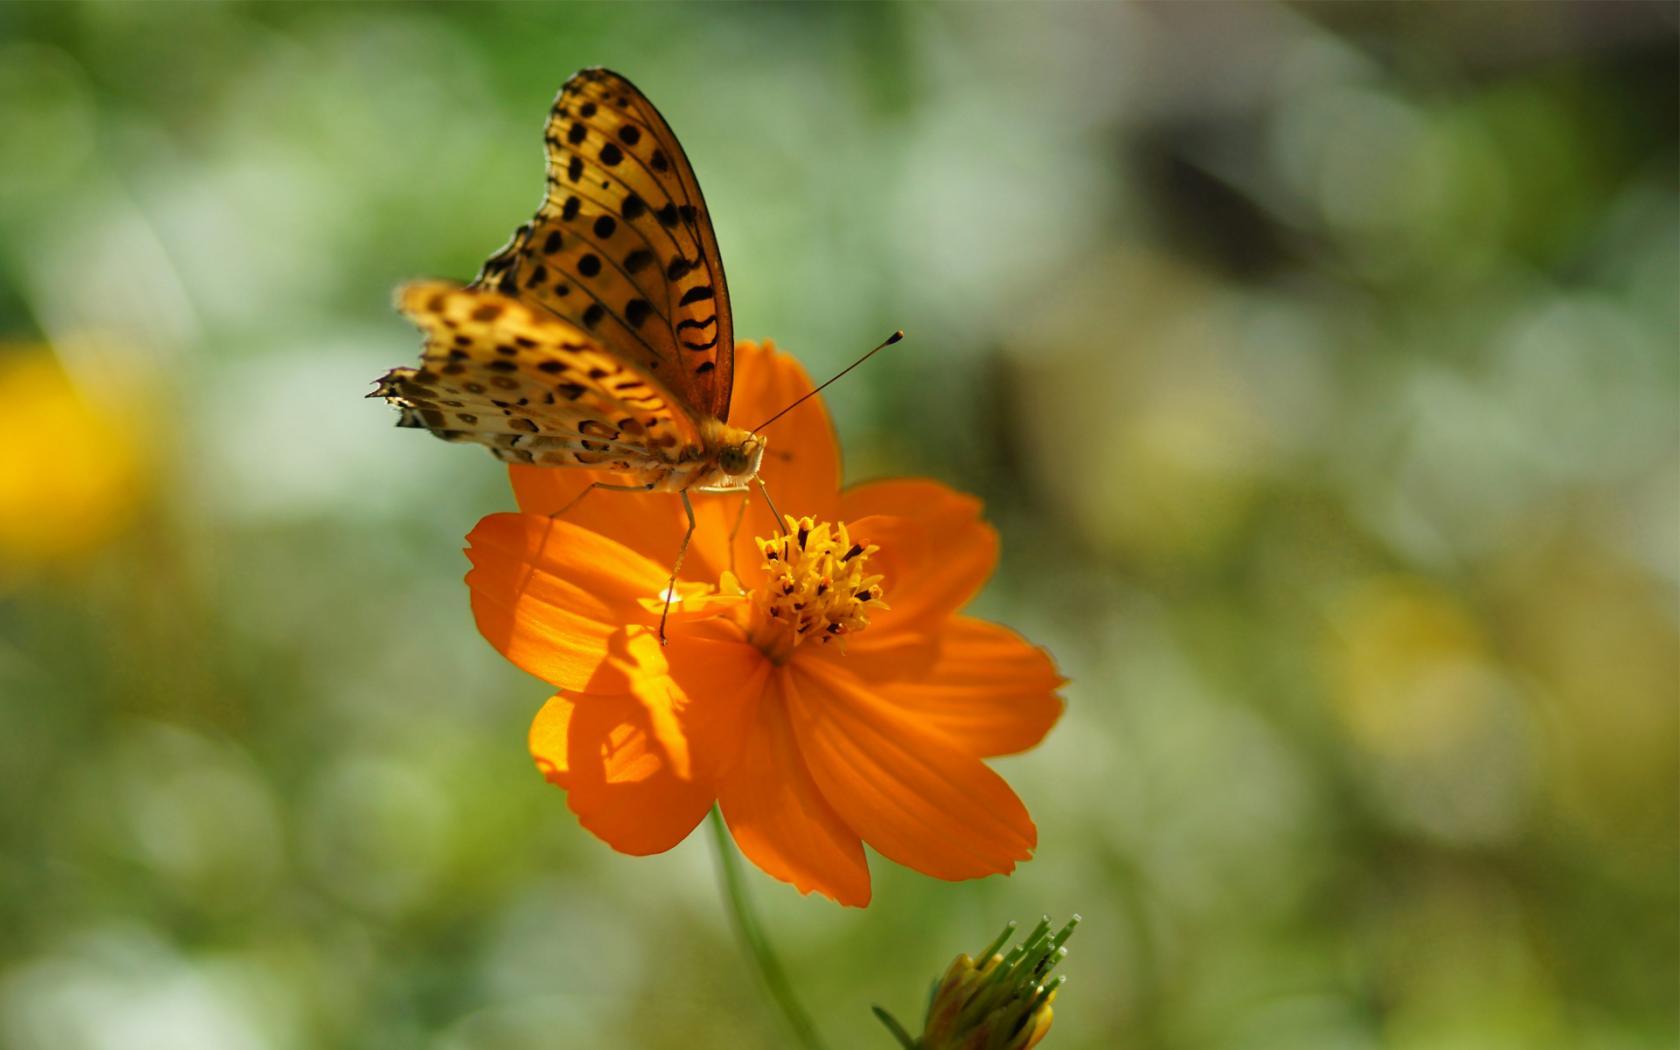 Фото клипарт – Луга, цветы, лето (76 ...: nevsepic.com.ua/ostalnoe-bez-razdela/page,1,20600-foto-klipart-luga...